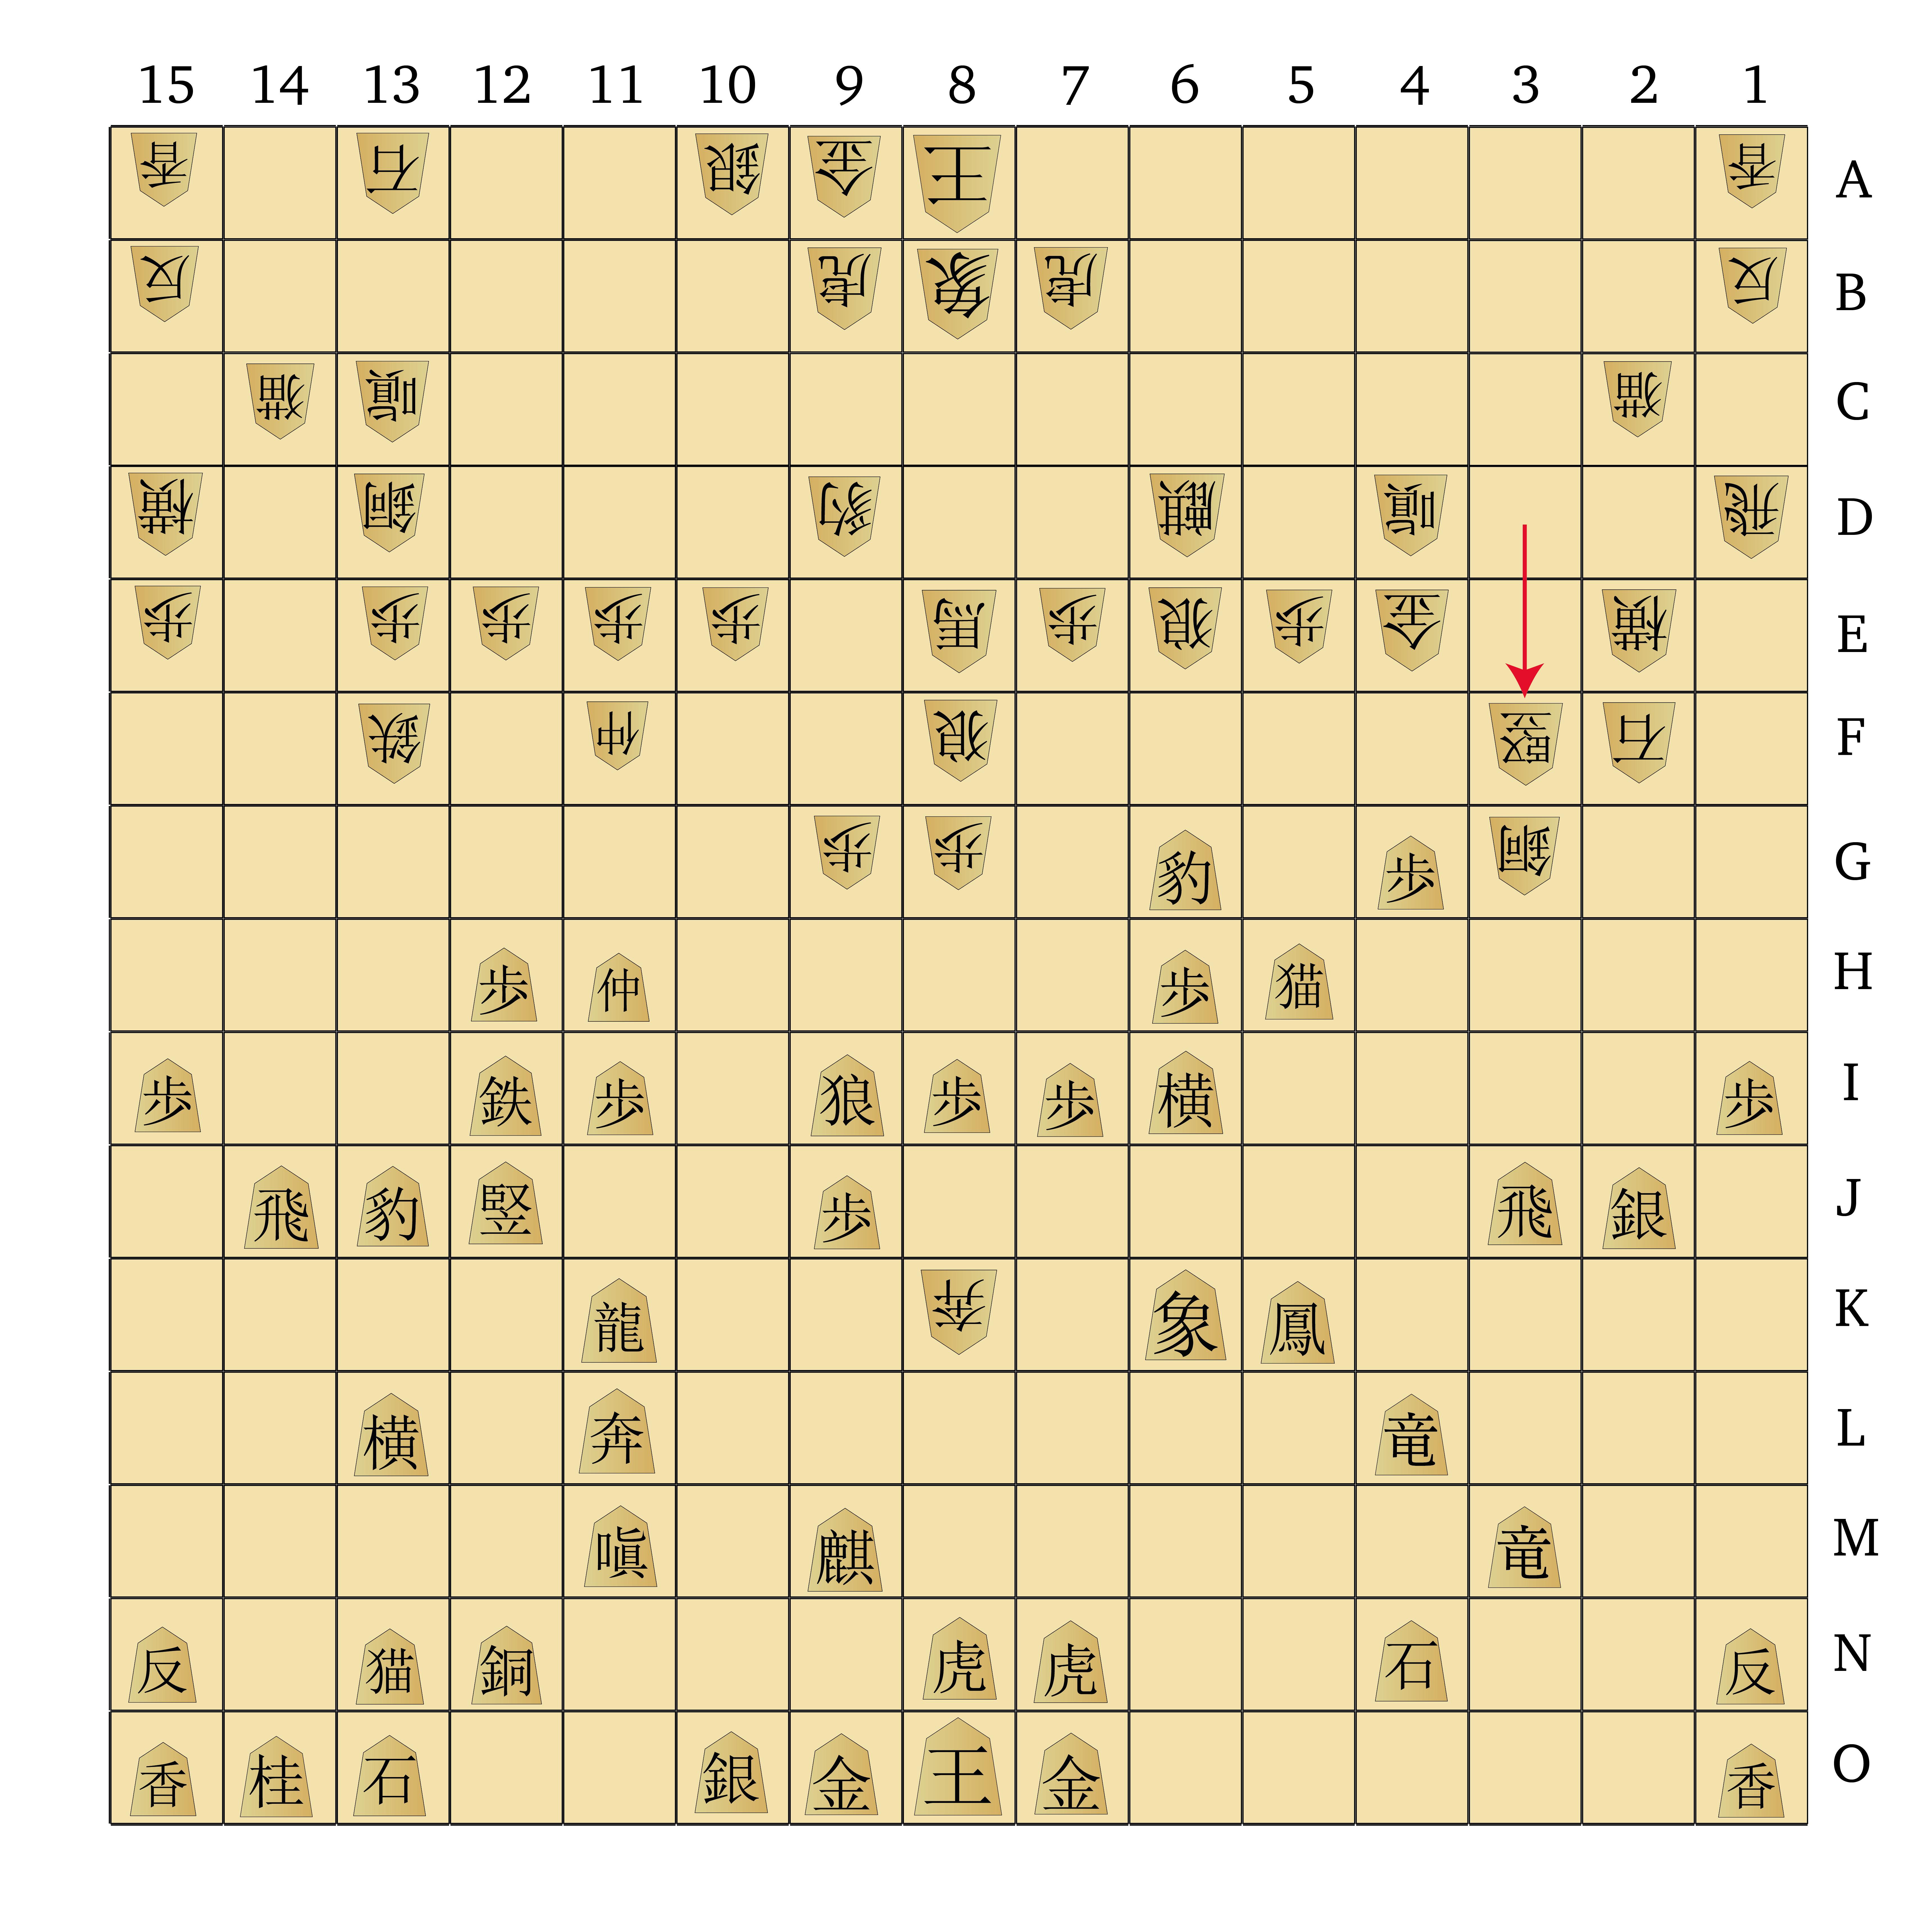 Dai Shogi 420 -- Move 310-01